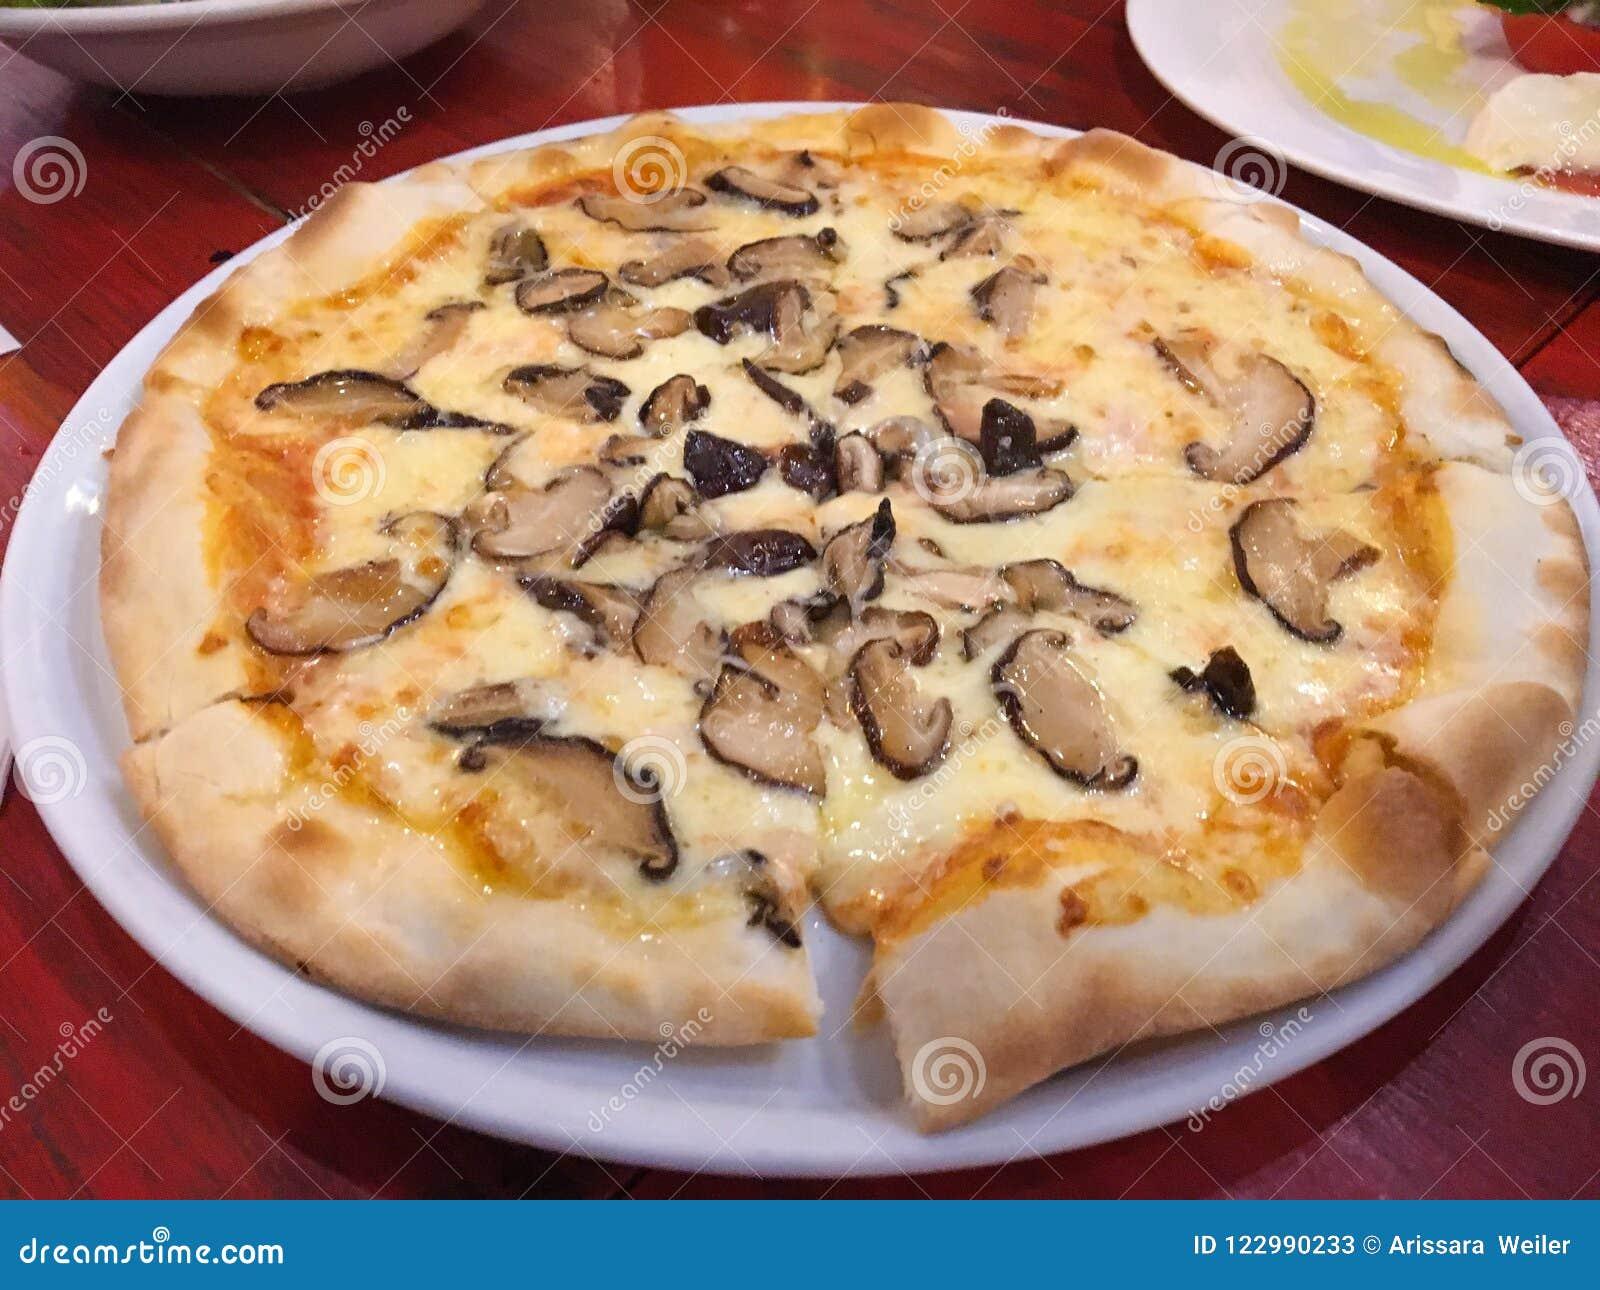 Homemade Mushroom Truffle Pizza With Cheese Stock Image Image Of